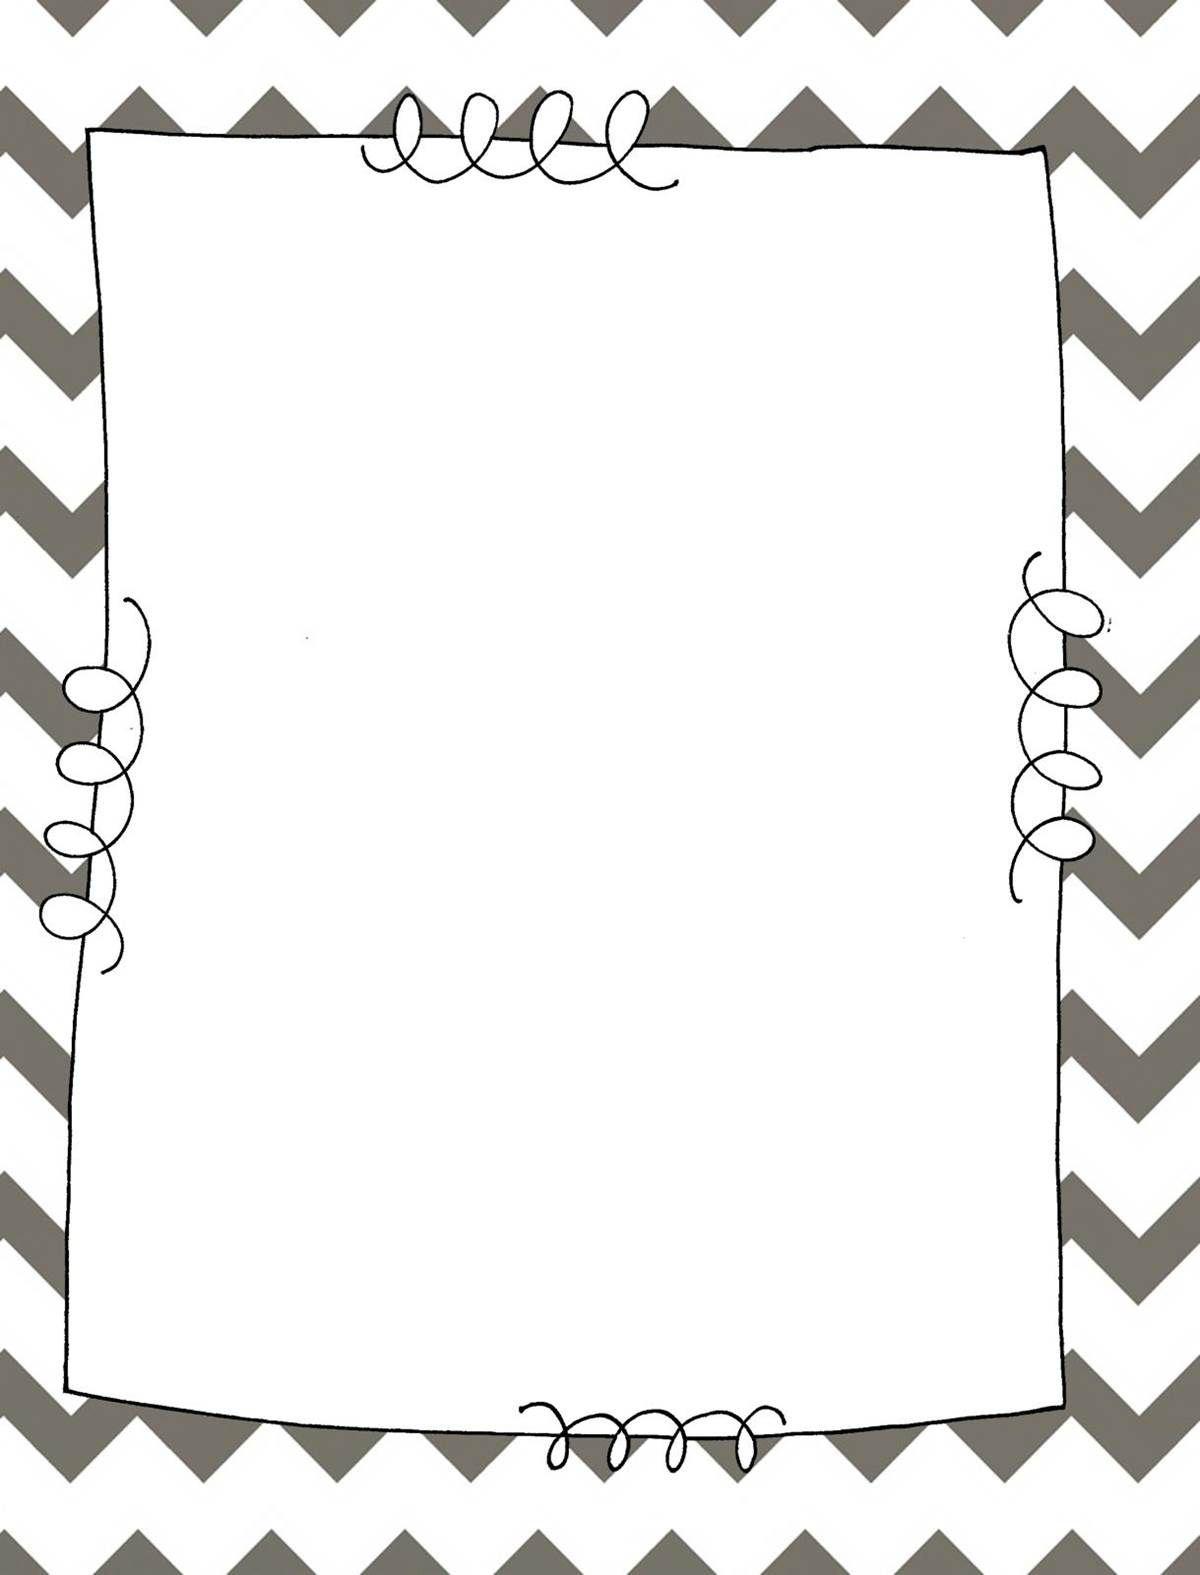 Teacher Binder Cover Free Printable   Binder Spines Are Included For - Free Printable Teacher Binder Covers